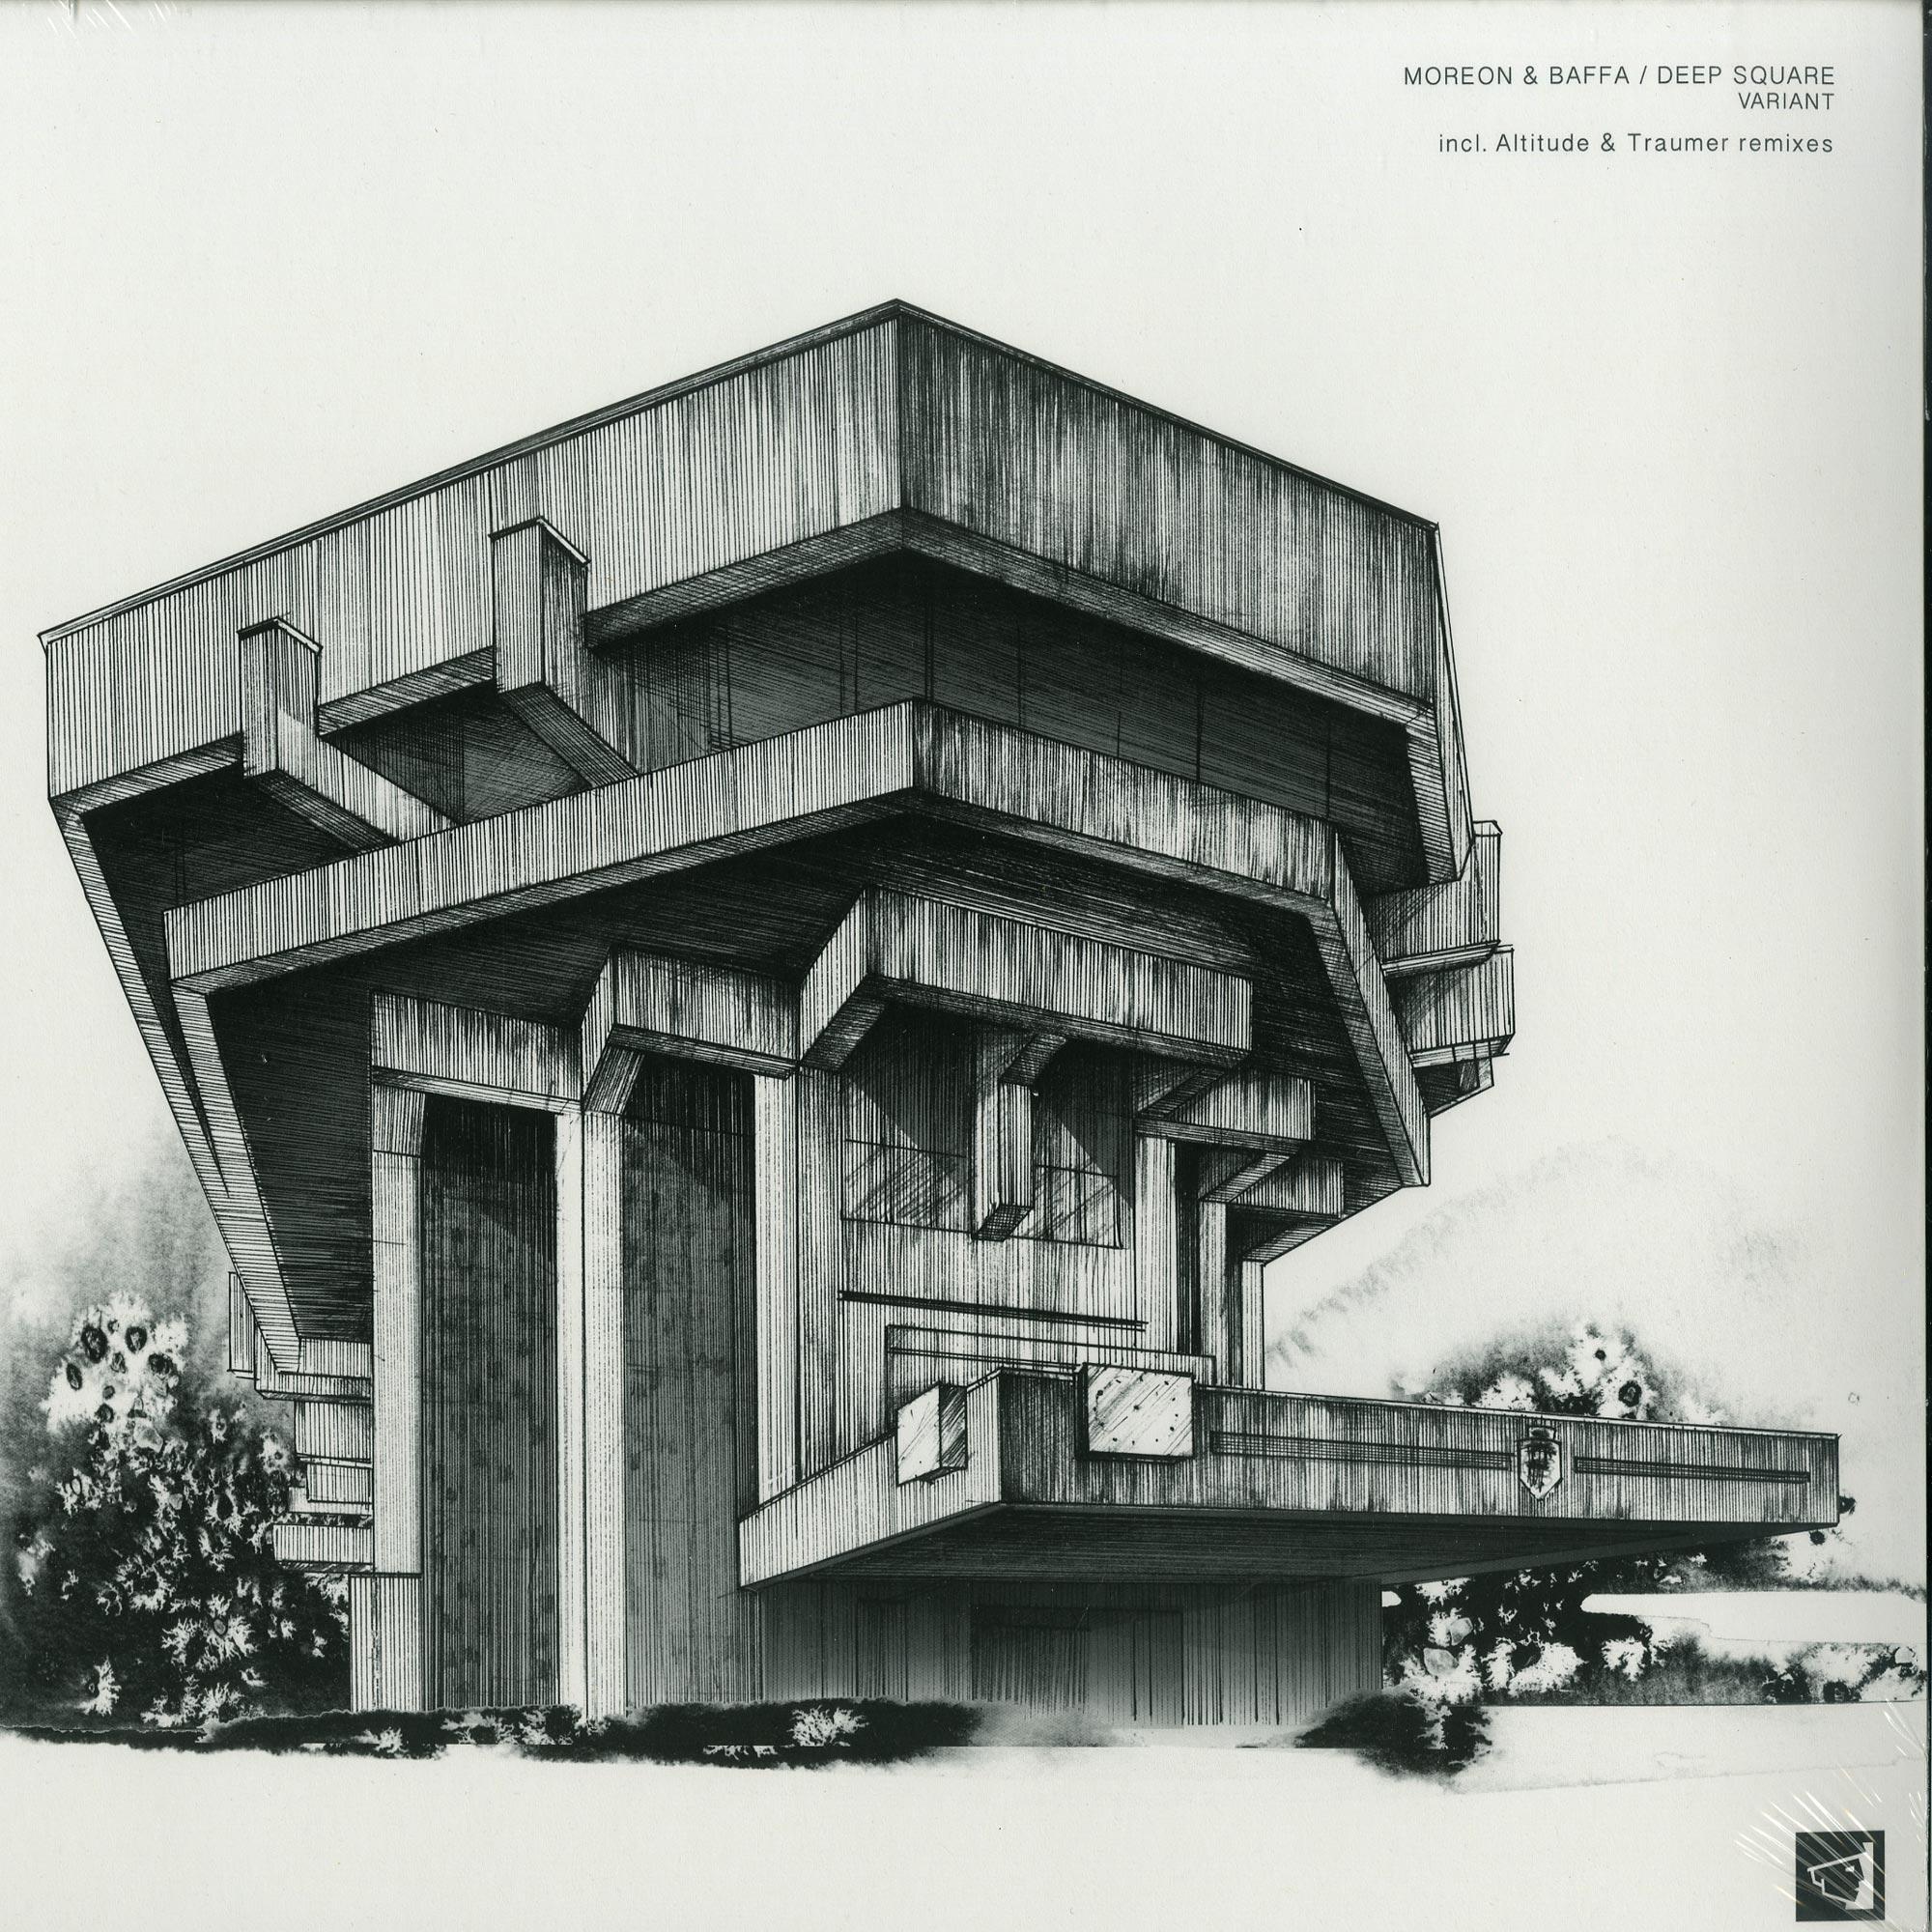 Moreon & Baffa / Deep Square - VARIANT